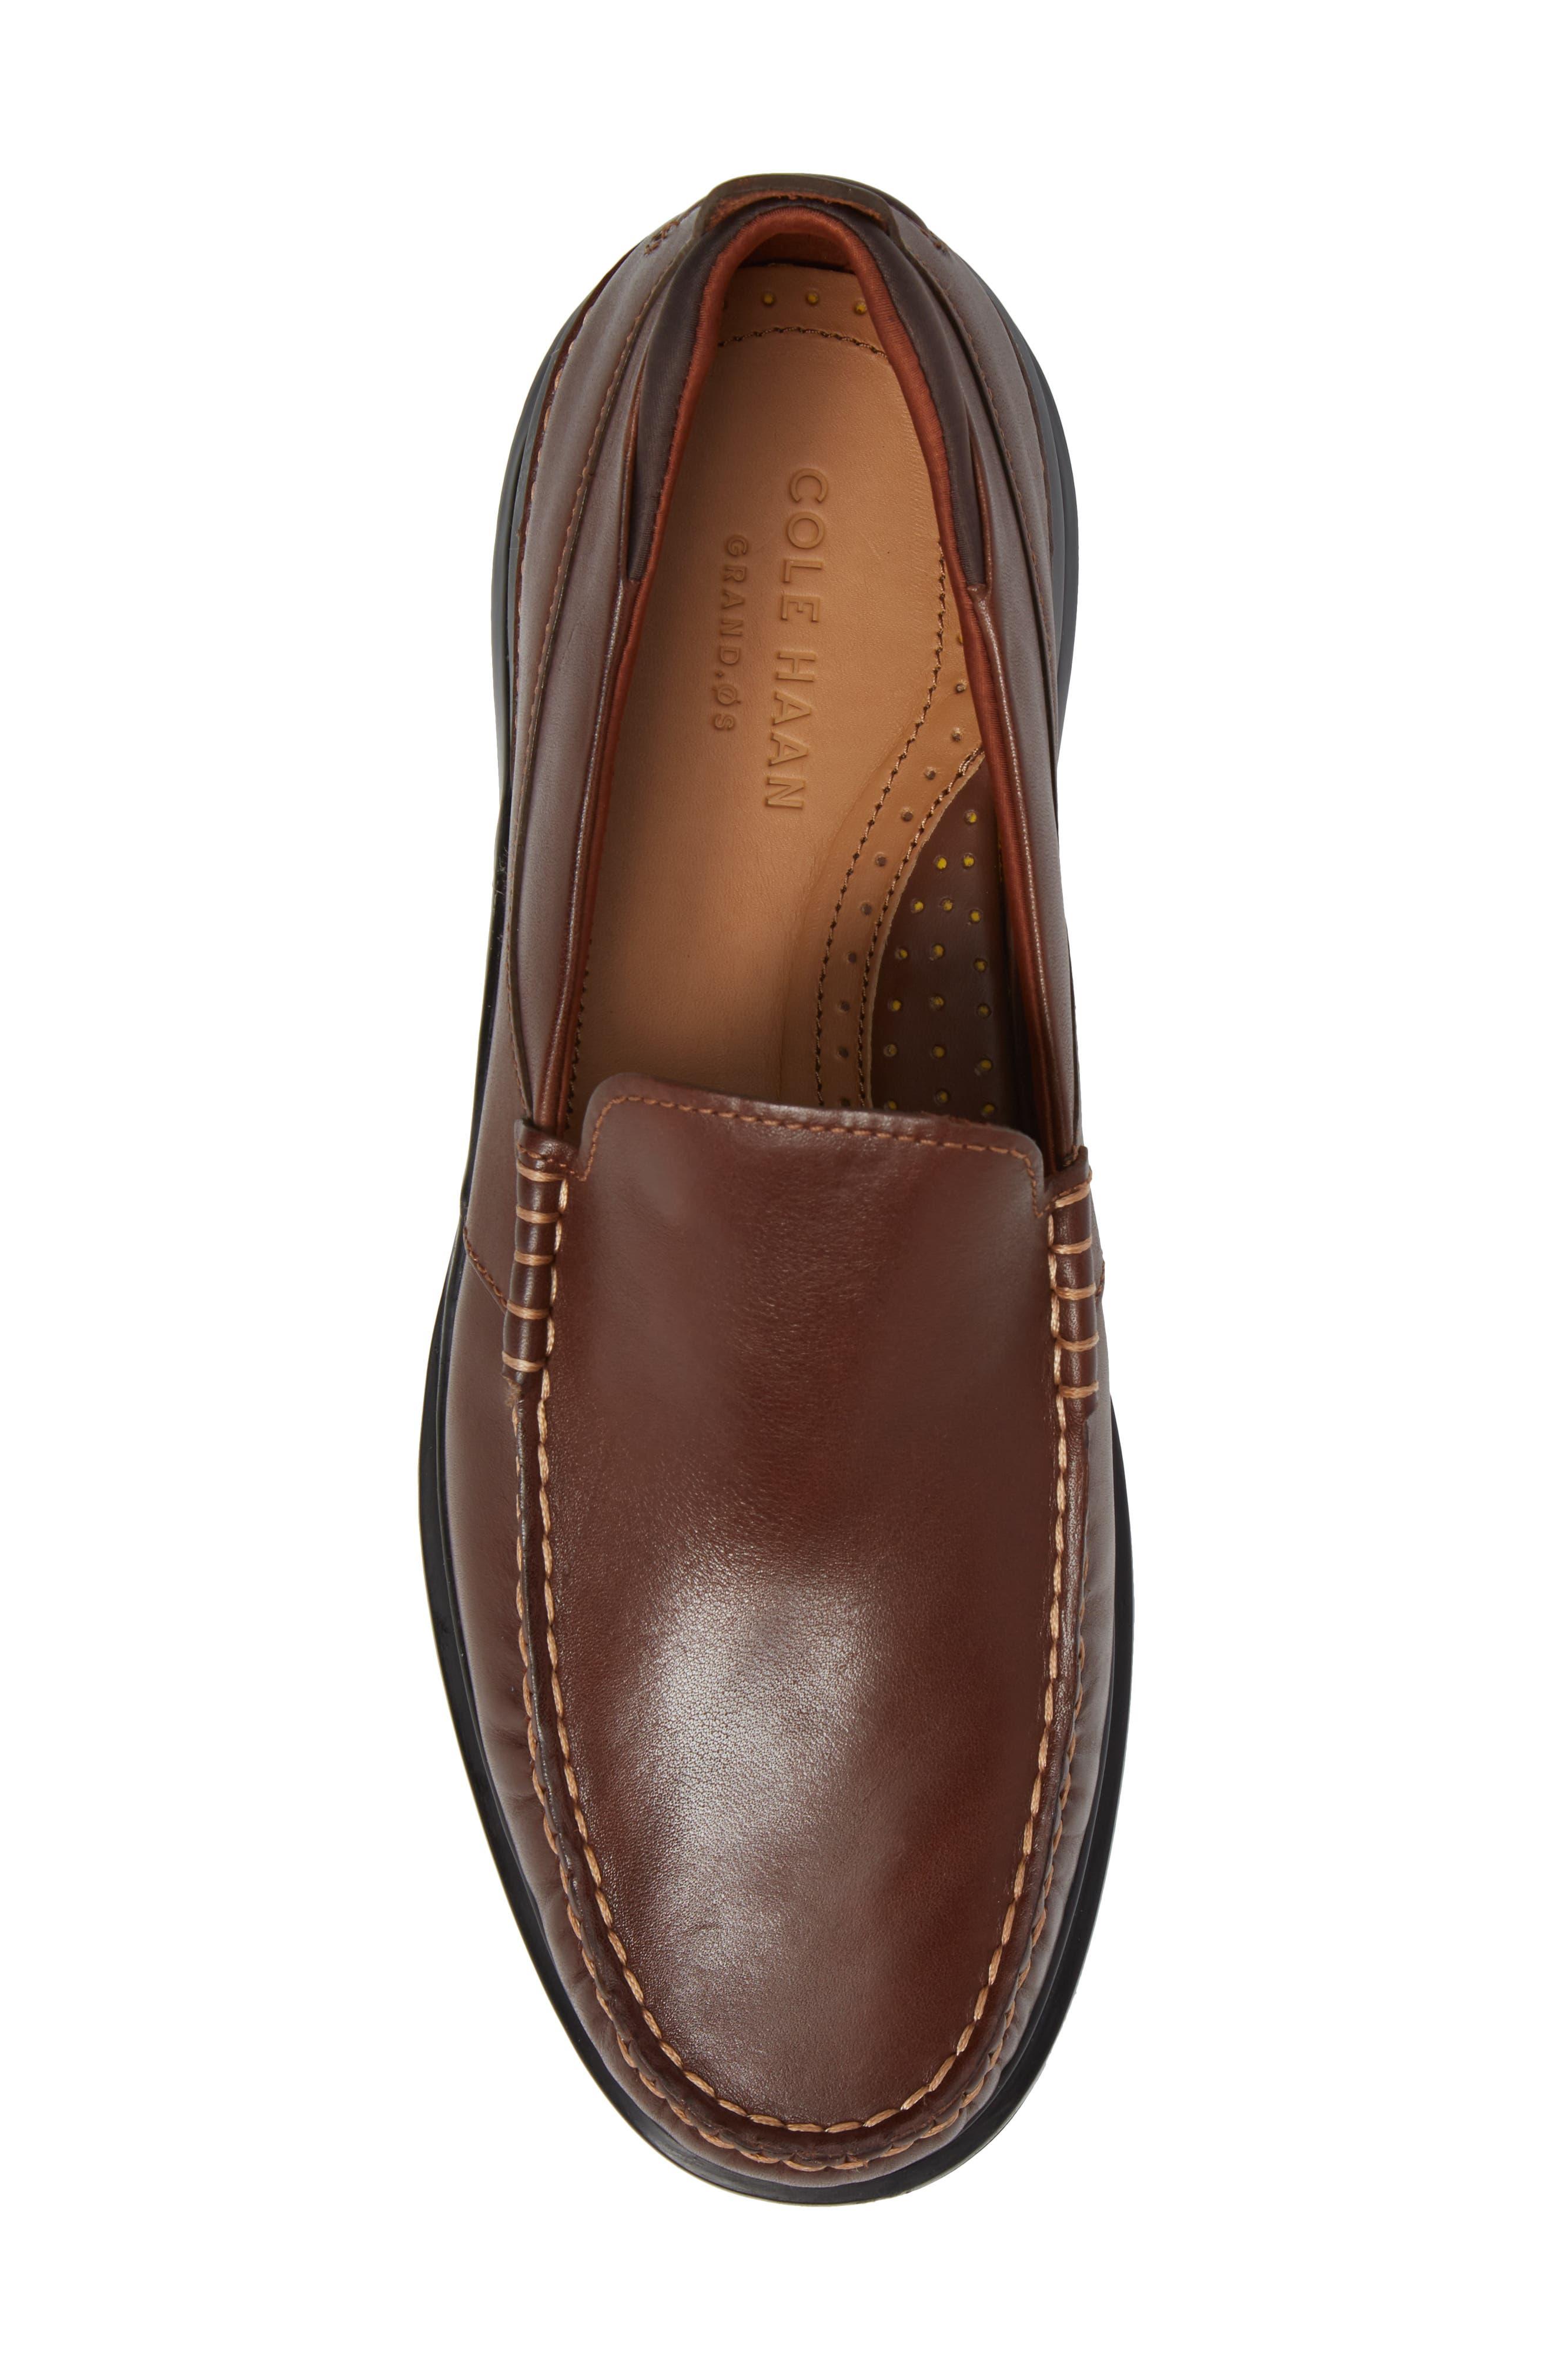 Bancroft Loafer,                             Alternate thumbnail 5, color,                             Harvest Brown Leather